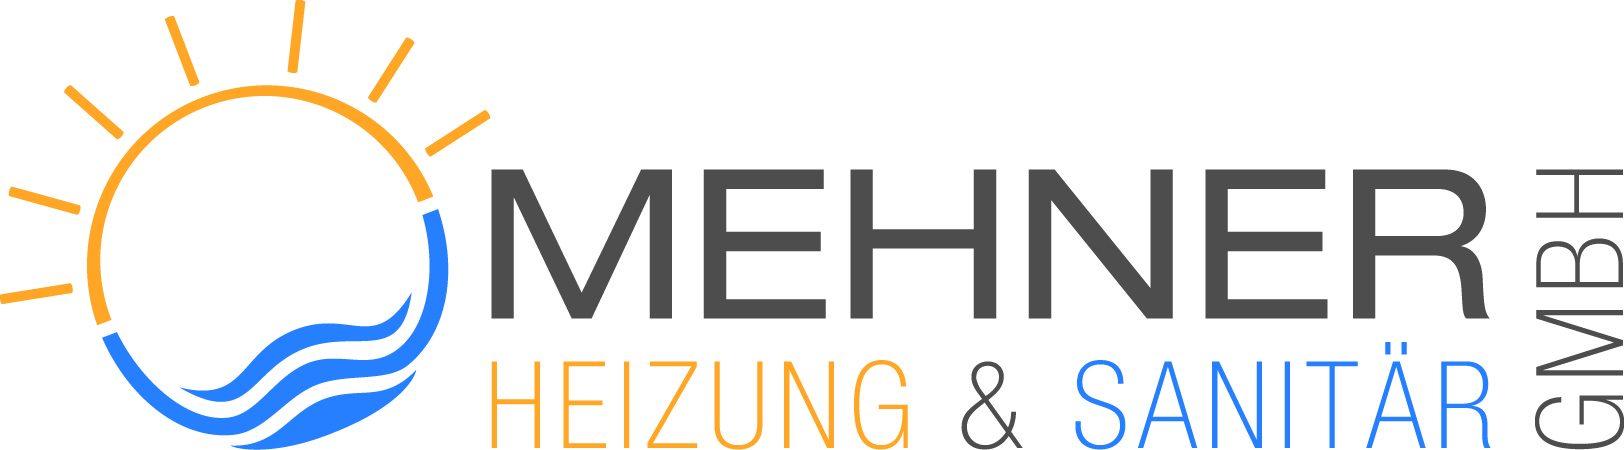 Mehner Heizung & Sanitär GmbH